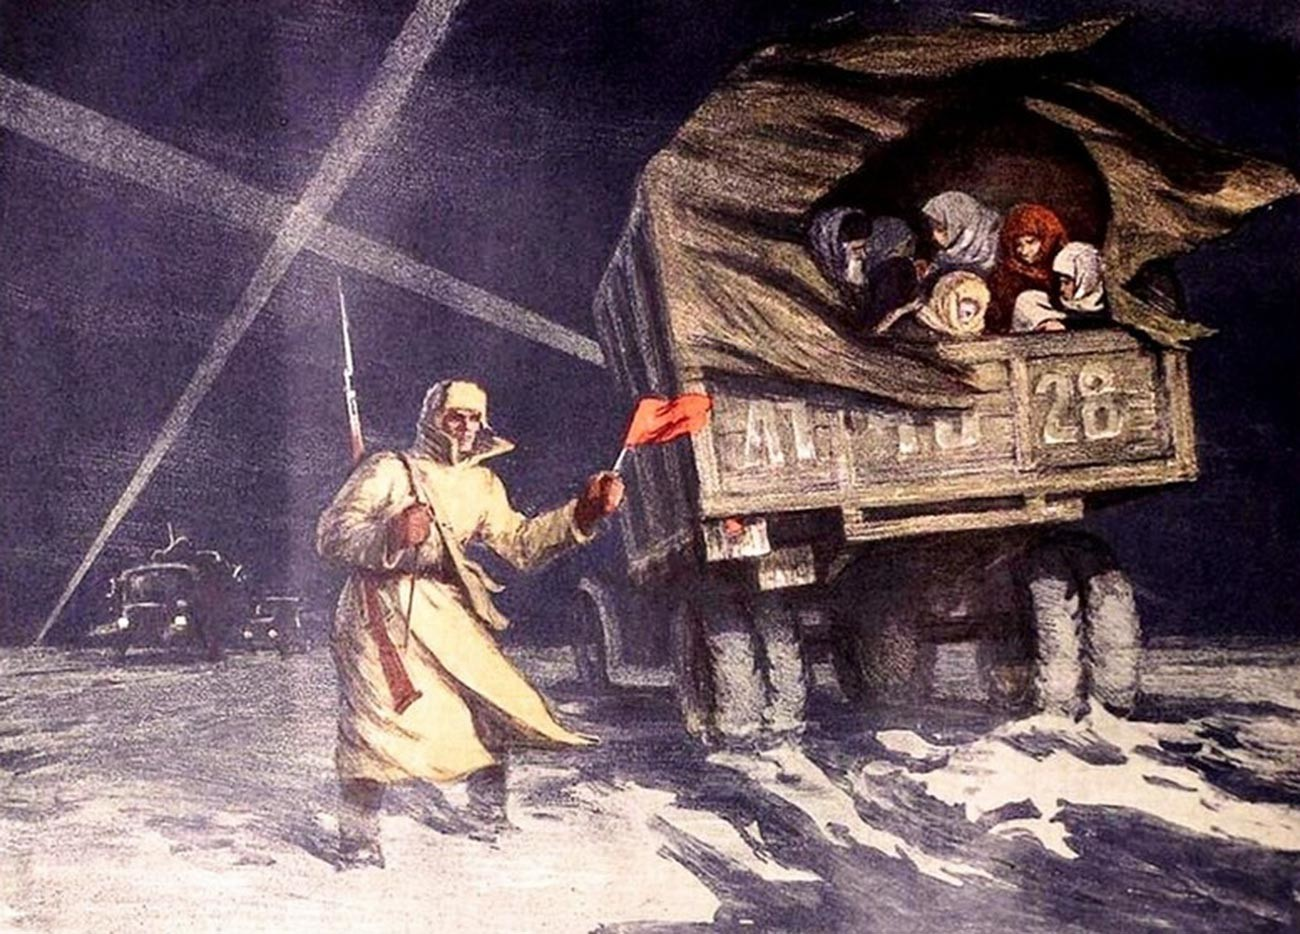 Solomon Boim. Ladoga – cesta življenja, 1949